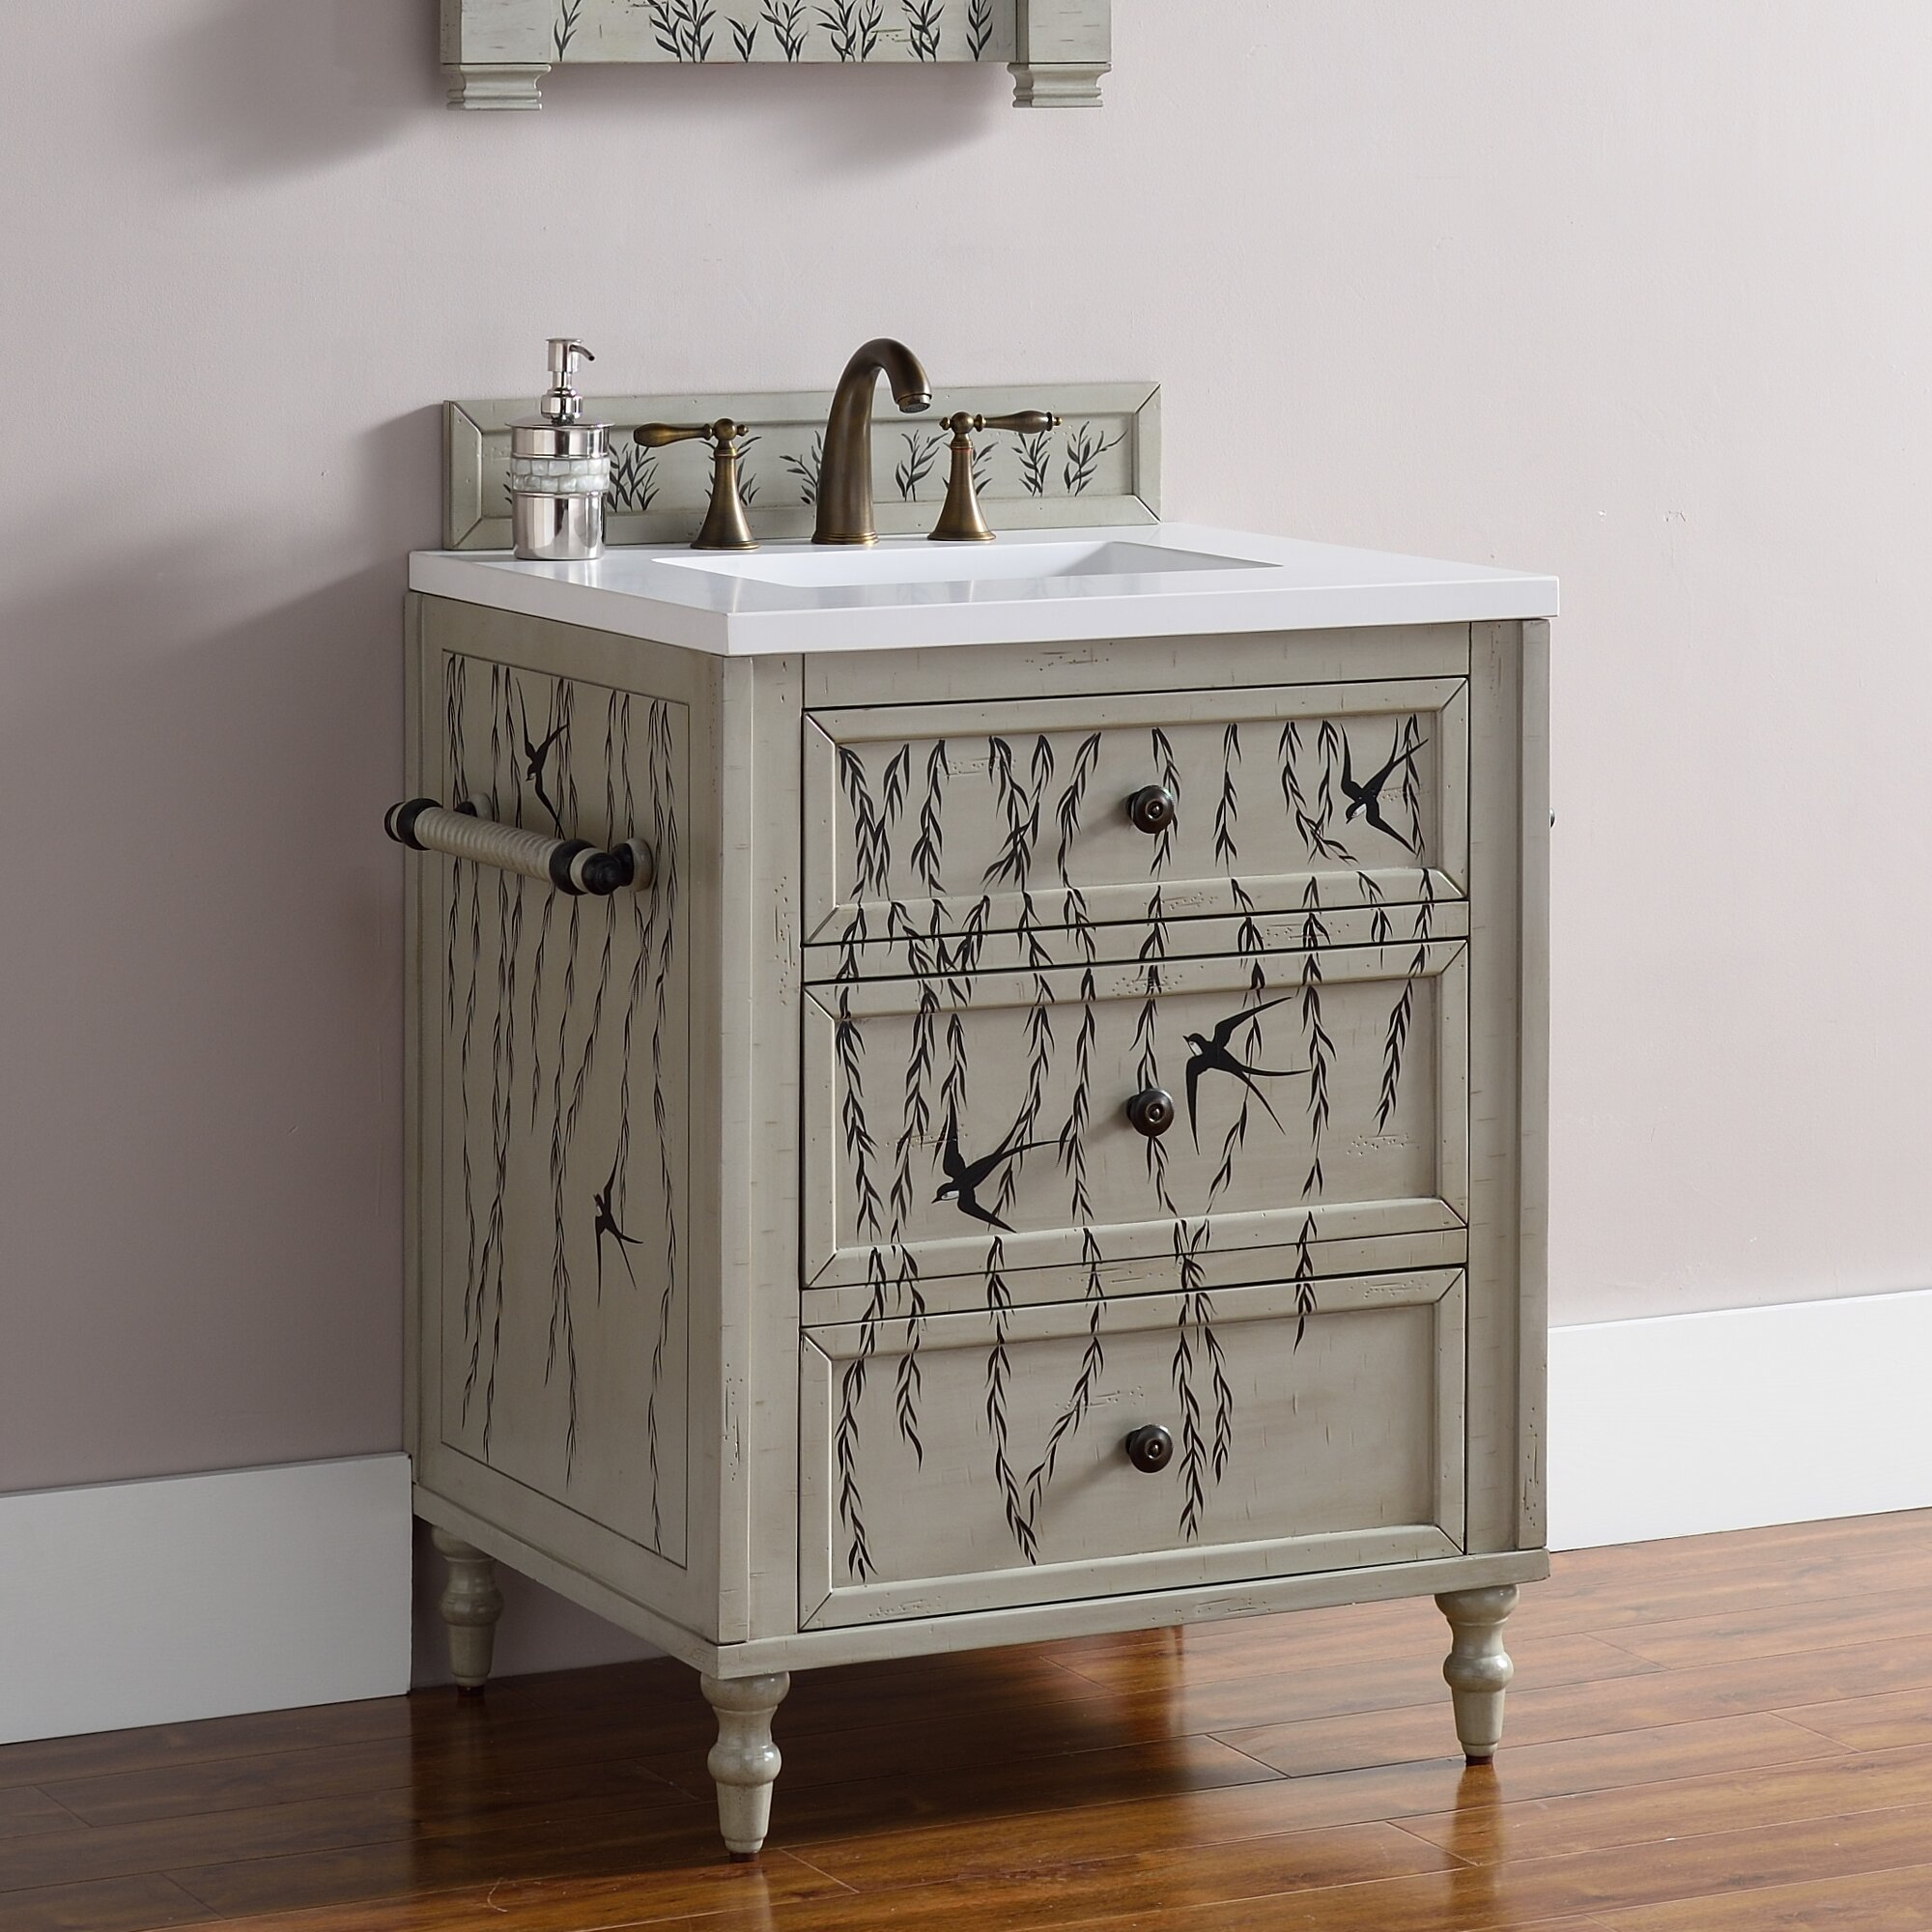 "Copper Bathroom Vanity: James Martin Furniture Copper Cove 26"" Single Bathroom"